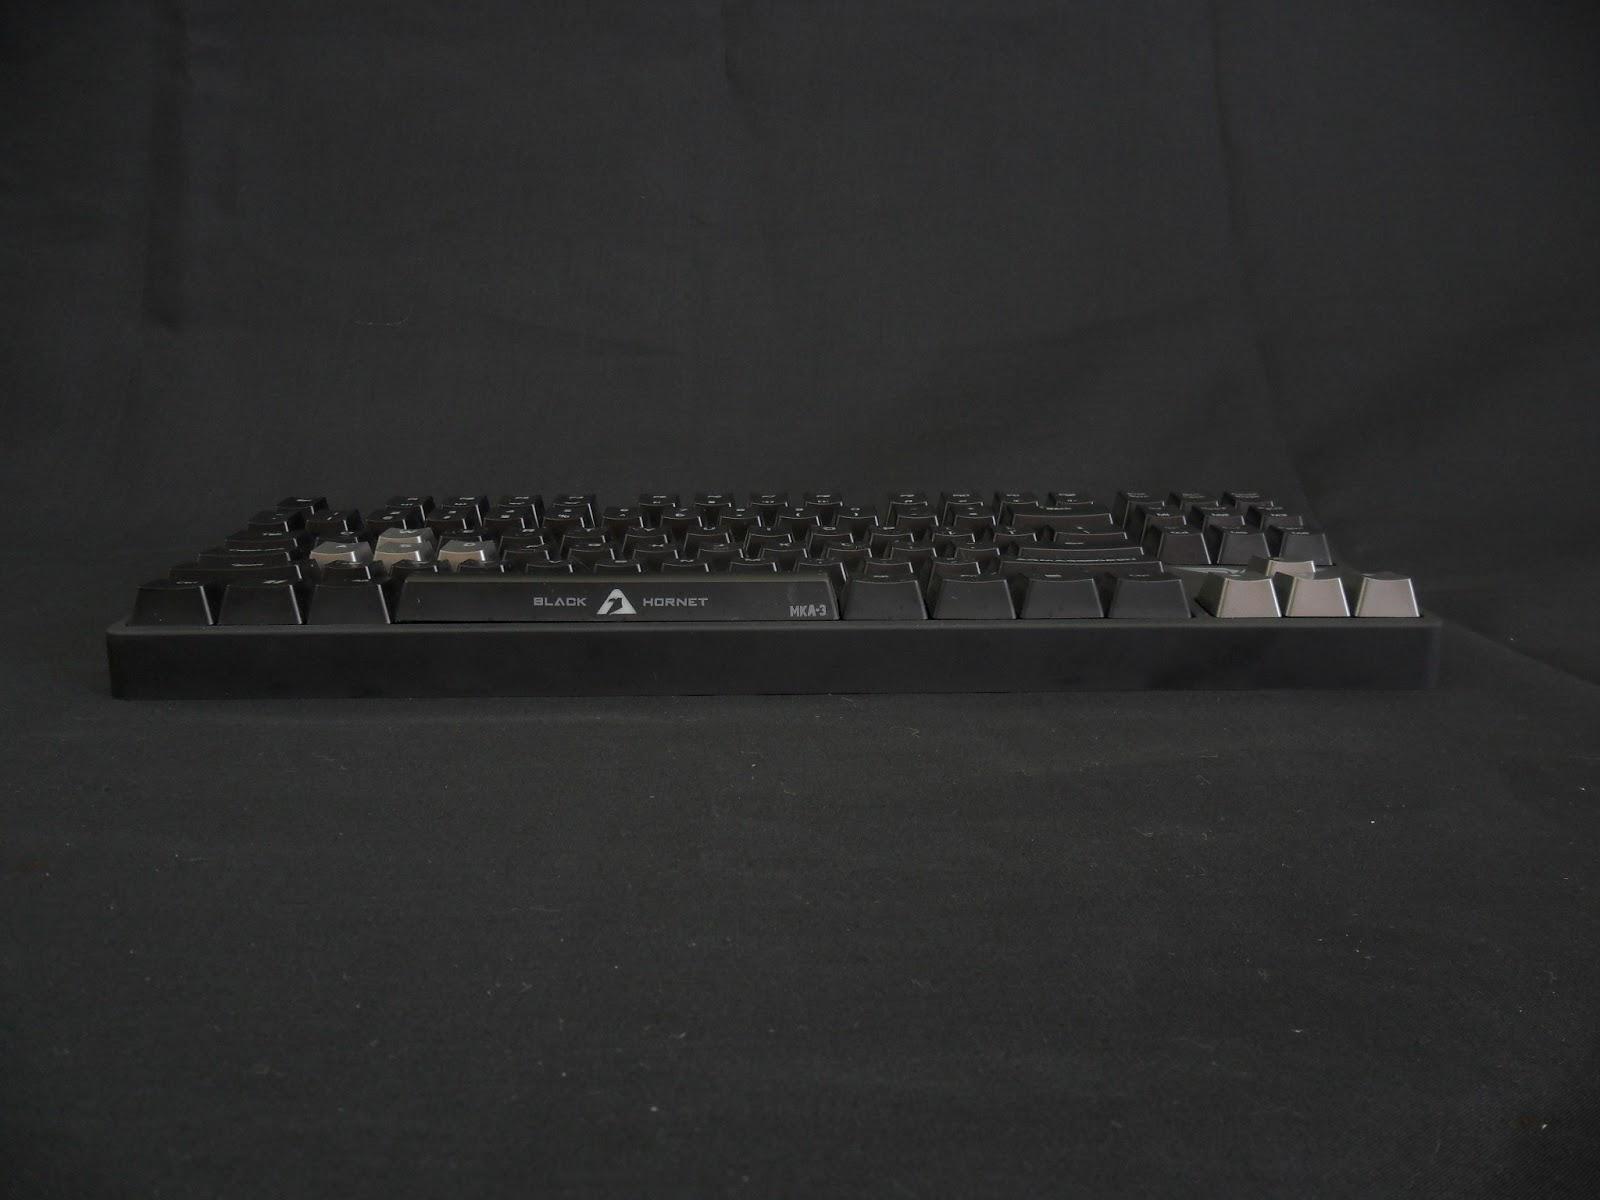 Unboxing & Review: Armaggeddon Black Hornet MKA-3 Mechanical Gaming Keyboard 7